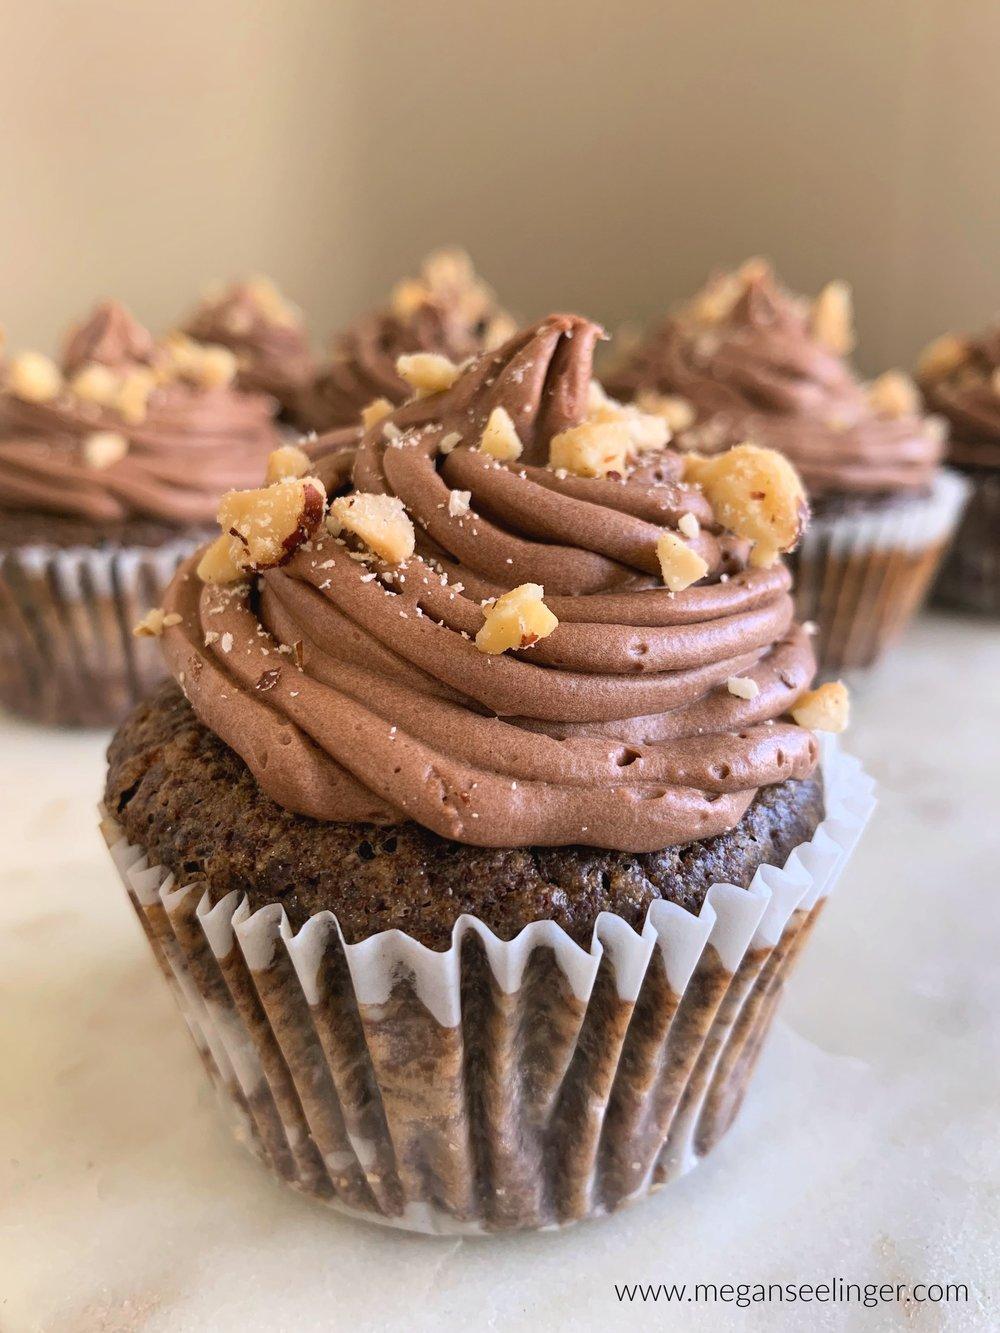 Chocolate Cupcakes With Chocolate Hazelnut Frosting